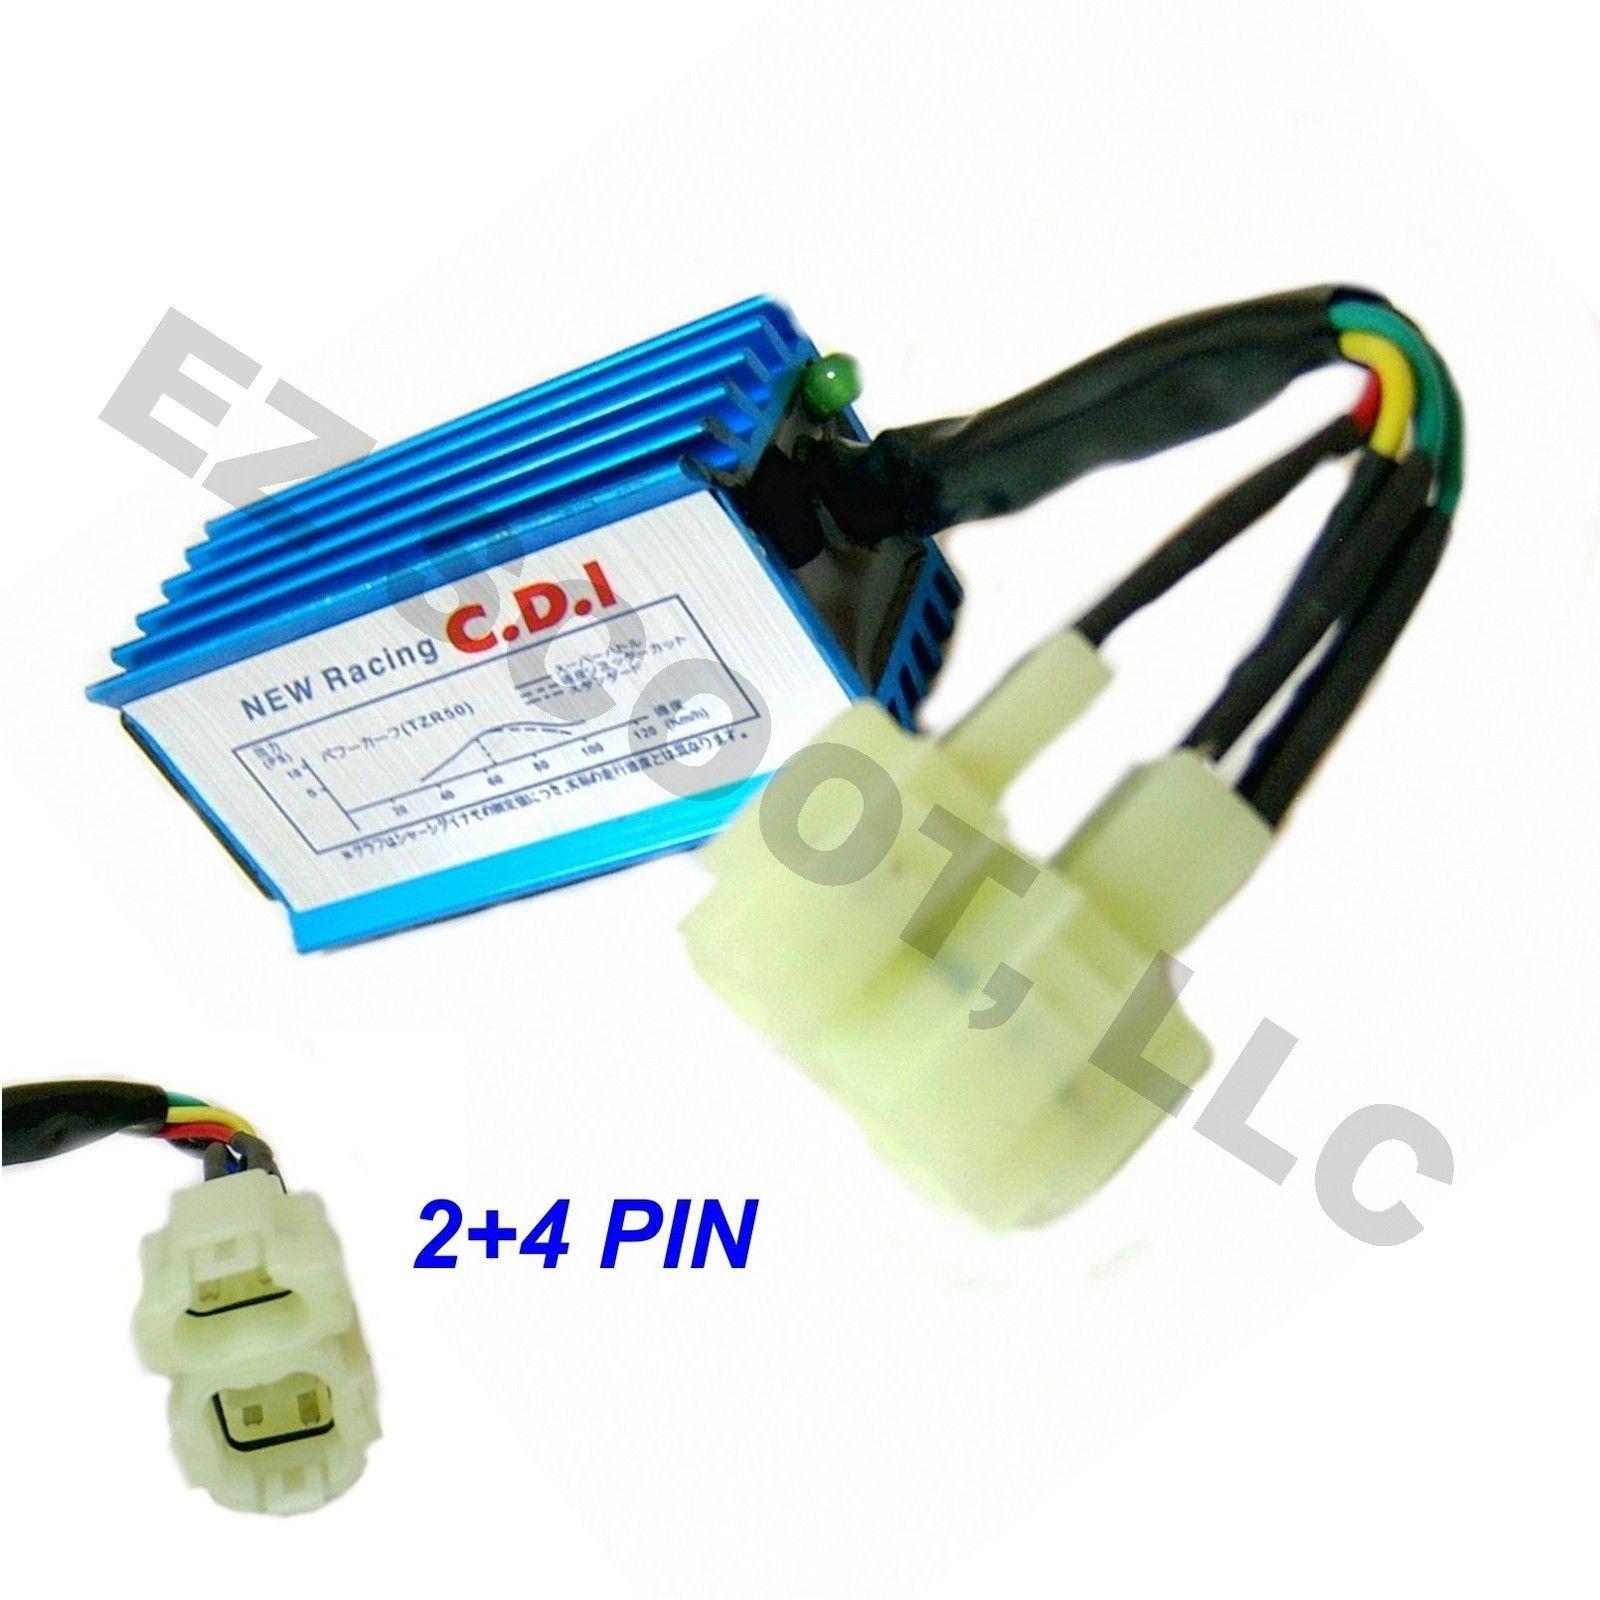 gy6 racing cdi wiring diagram ac cdi high performance 6 pin ac 50 150cc gy6 4 stroke chinese  high performance 6 pin ac 50 150cc gy6